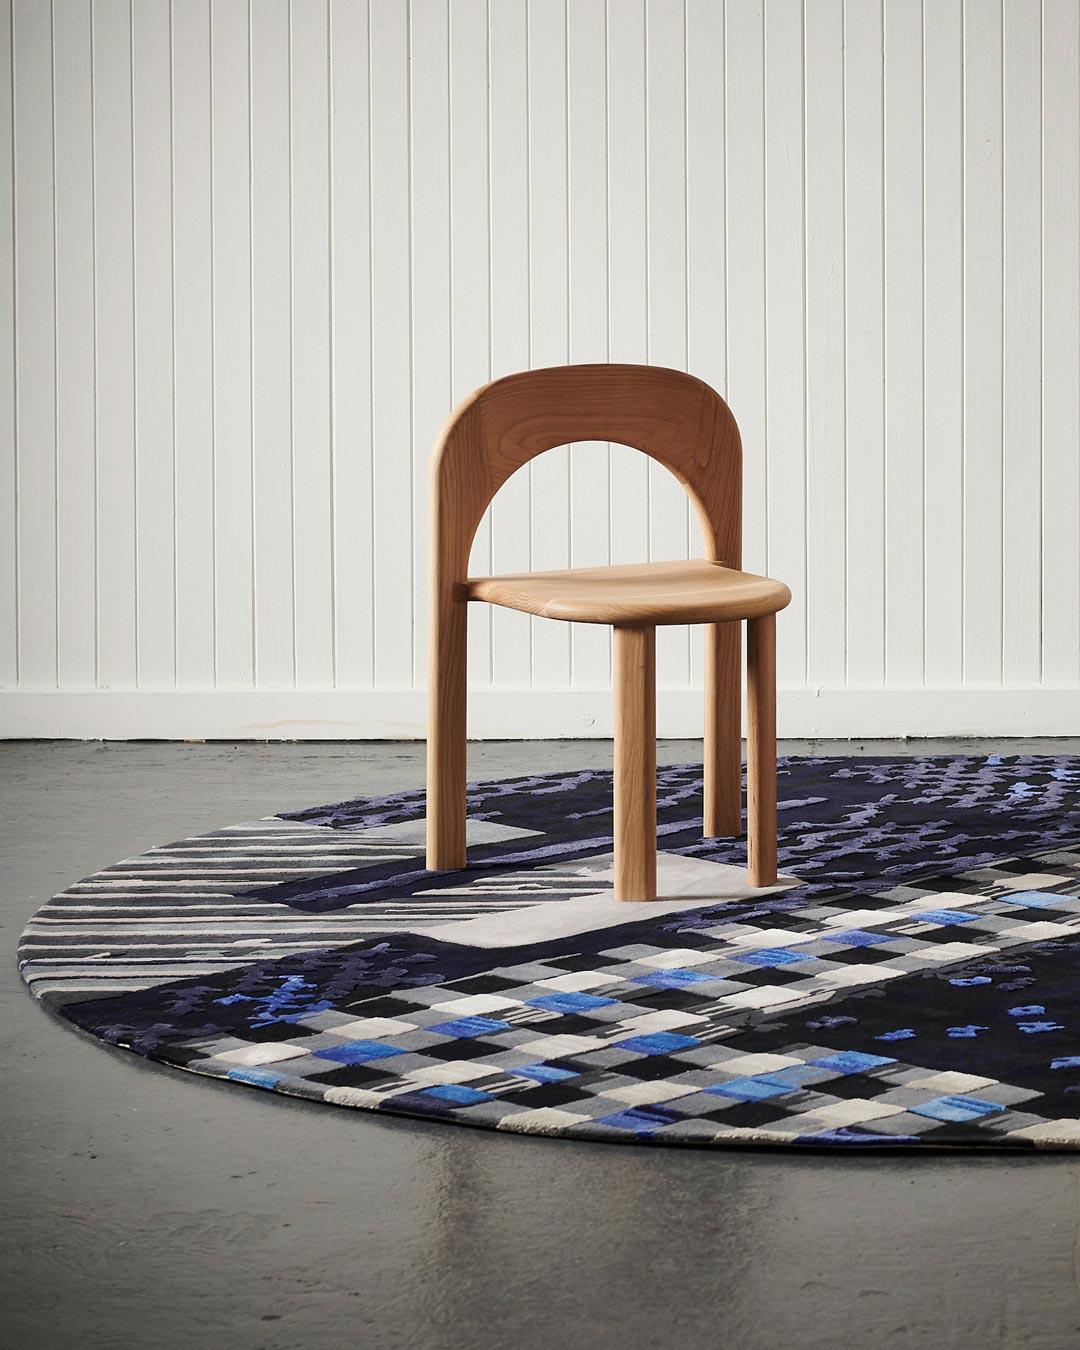 location shot of materiality 1 blue round rug by emma elizabeth designs